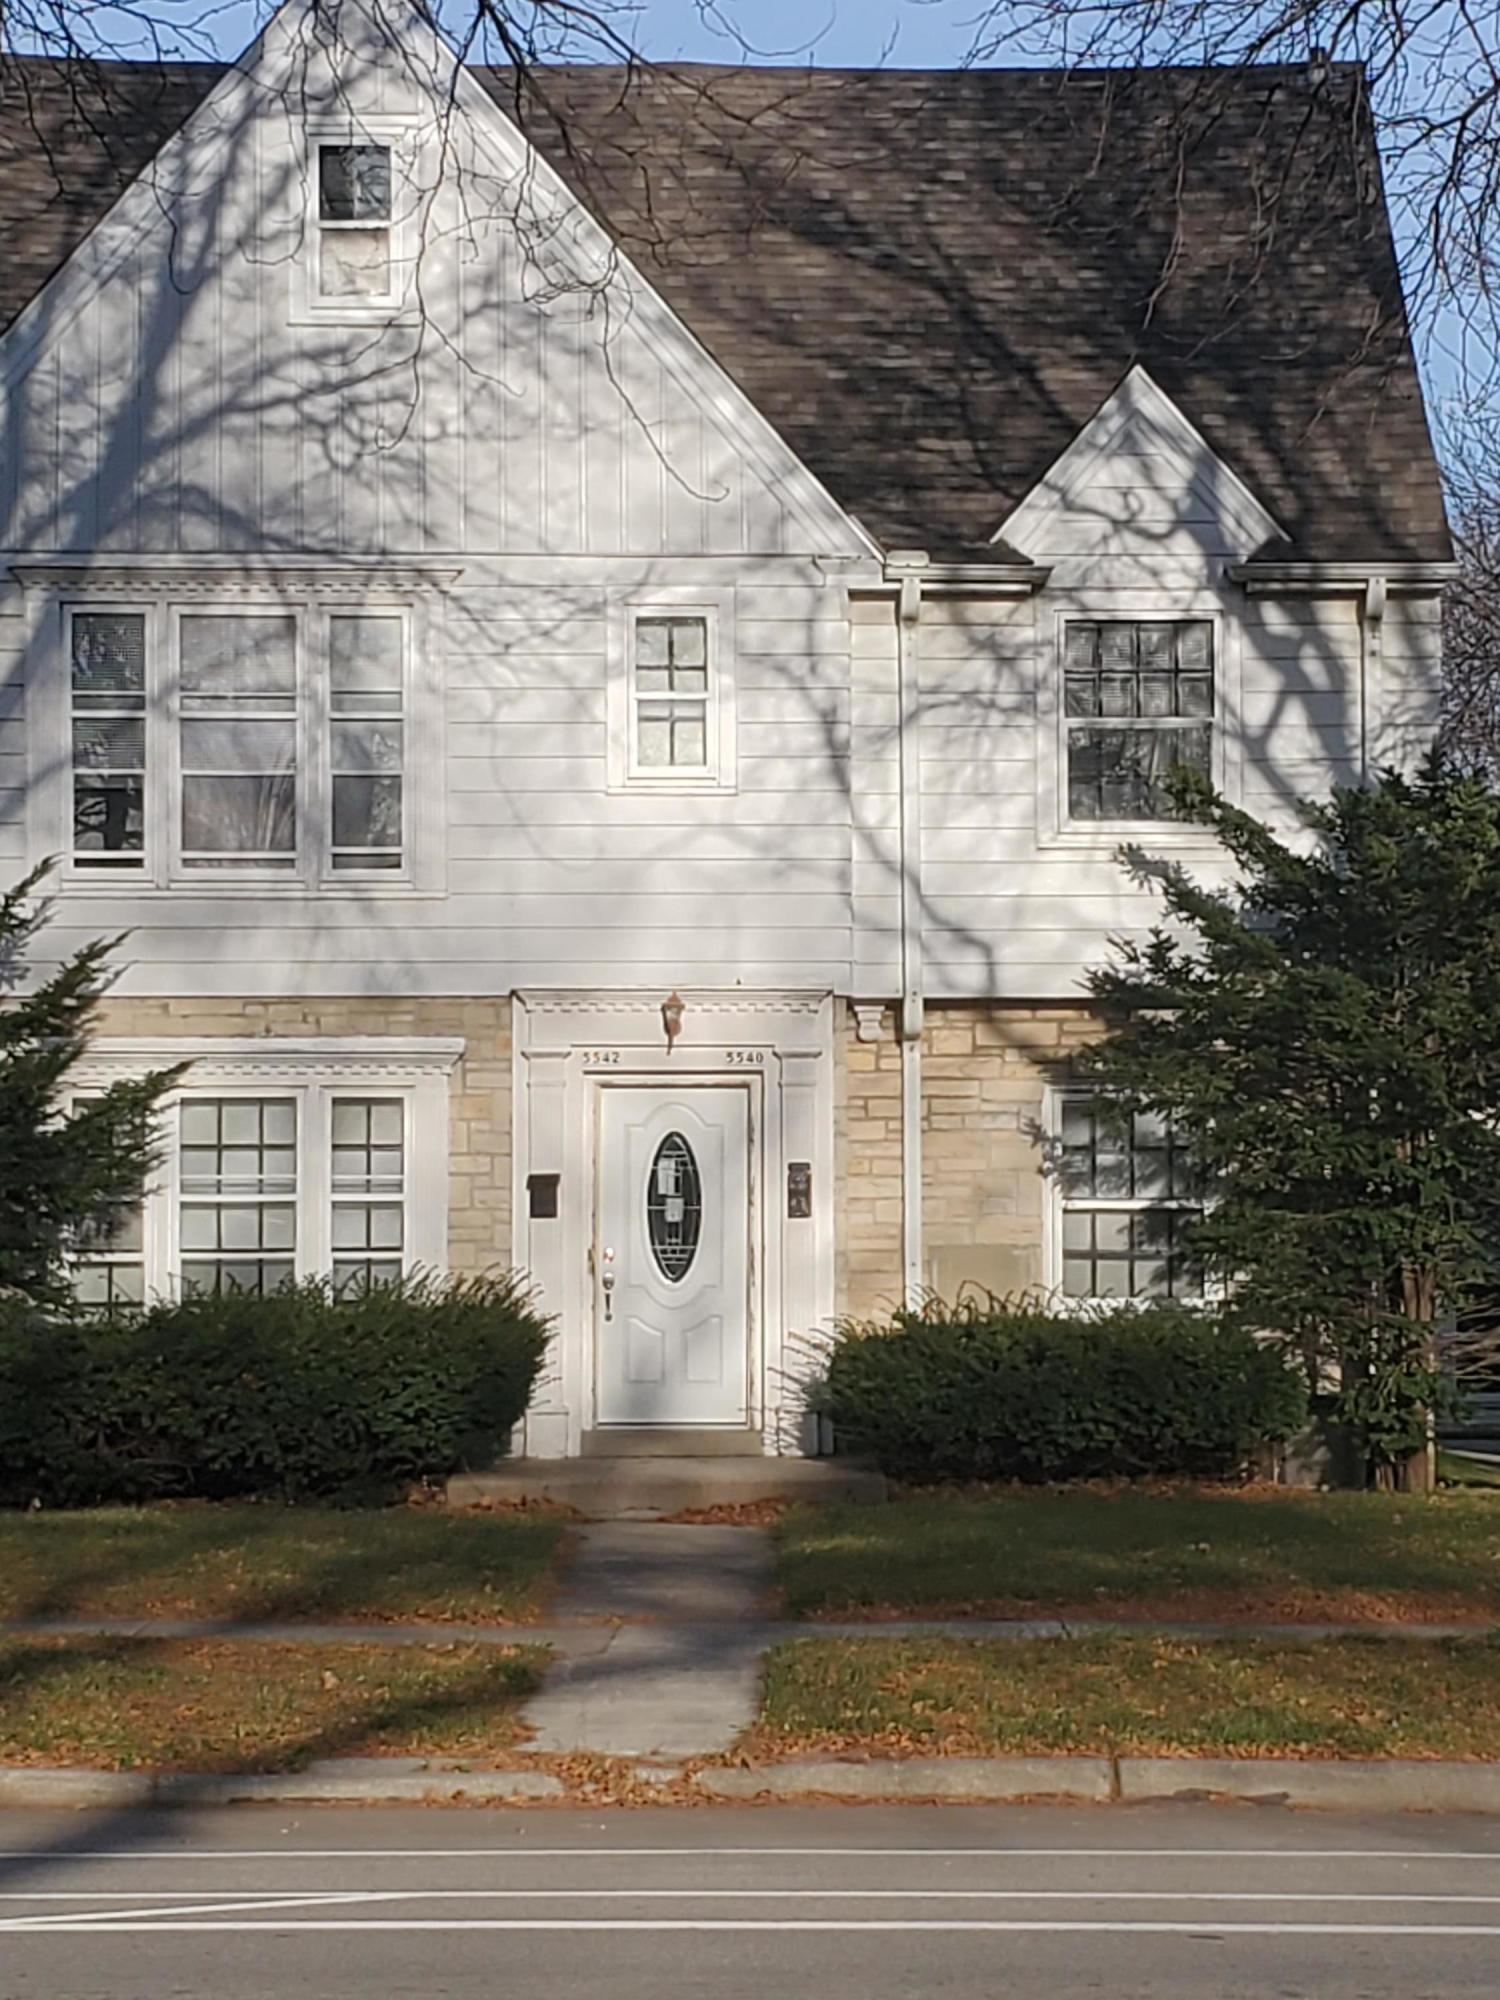 5540 Roosevelt Dr 5542, Milwaukee, Wisconsin 53216, 2 Bedrooms Bedrooms, 5 Rooms Rooms,1 BathroomBathrooms,Two-Family,For Sale,Roosevelt Dr 5542,1,1719914